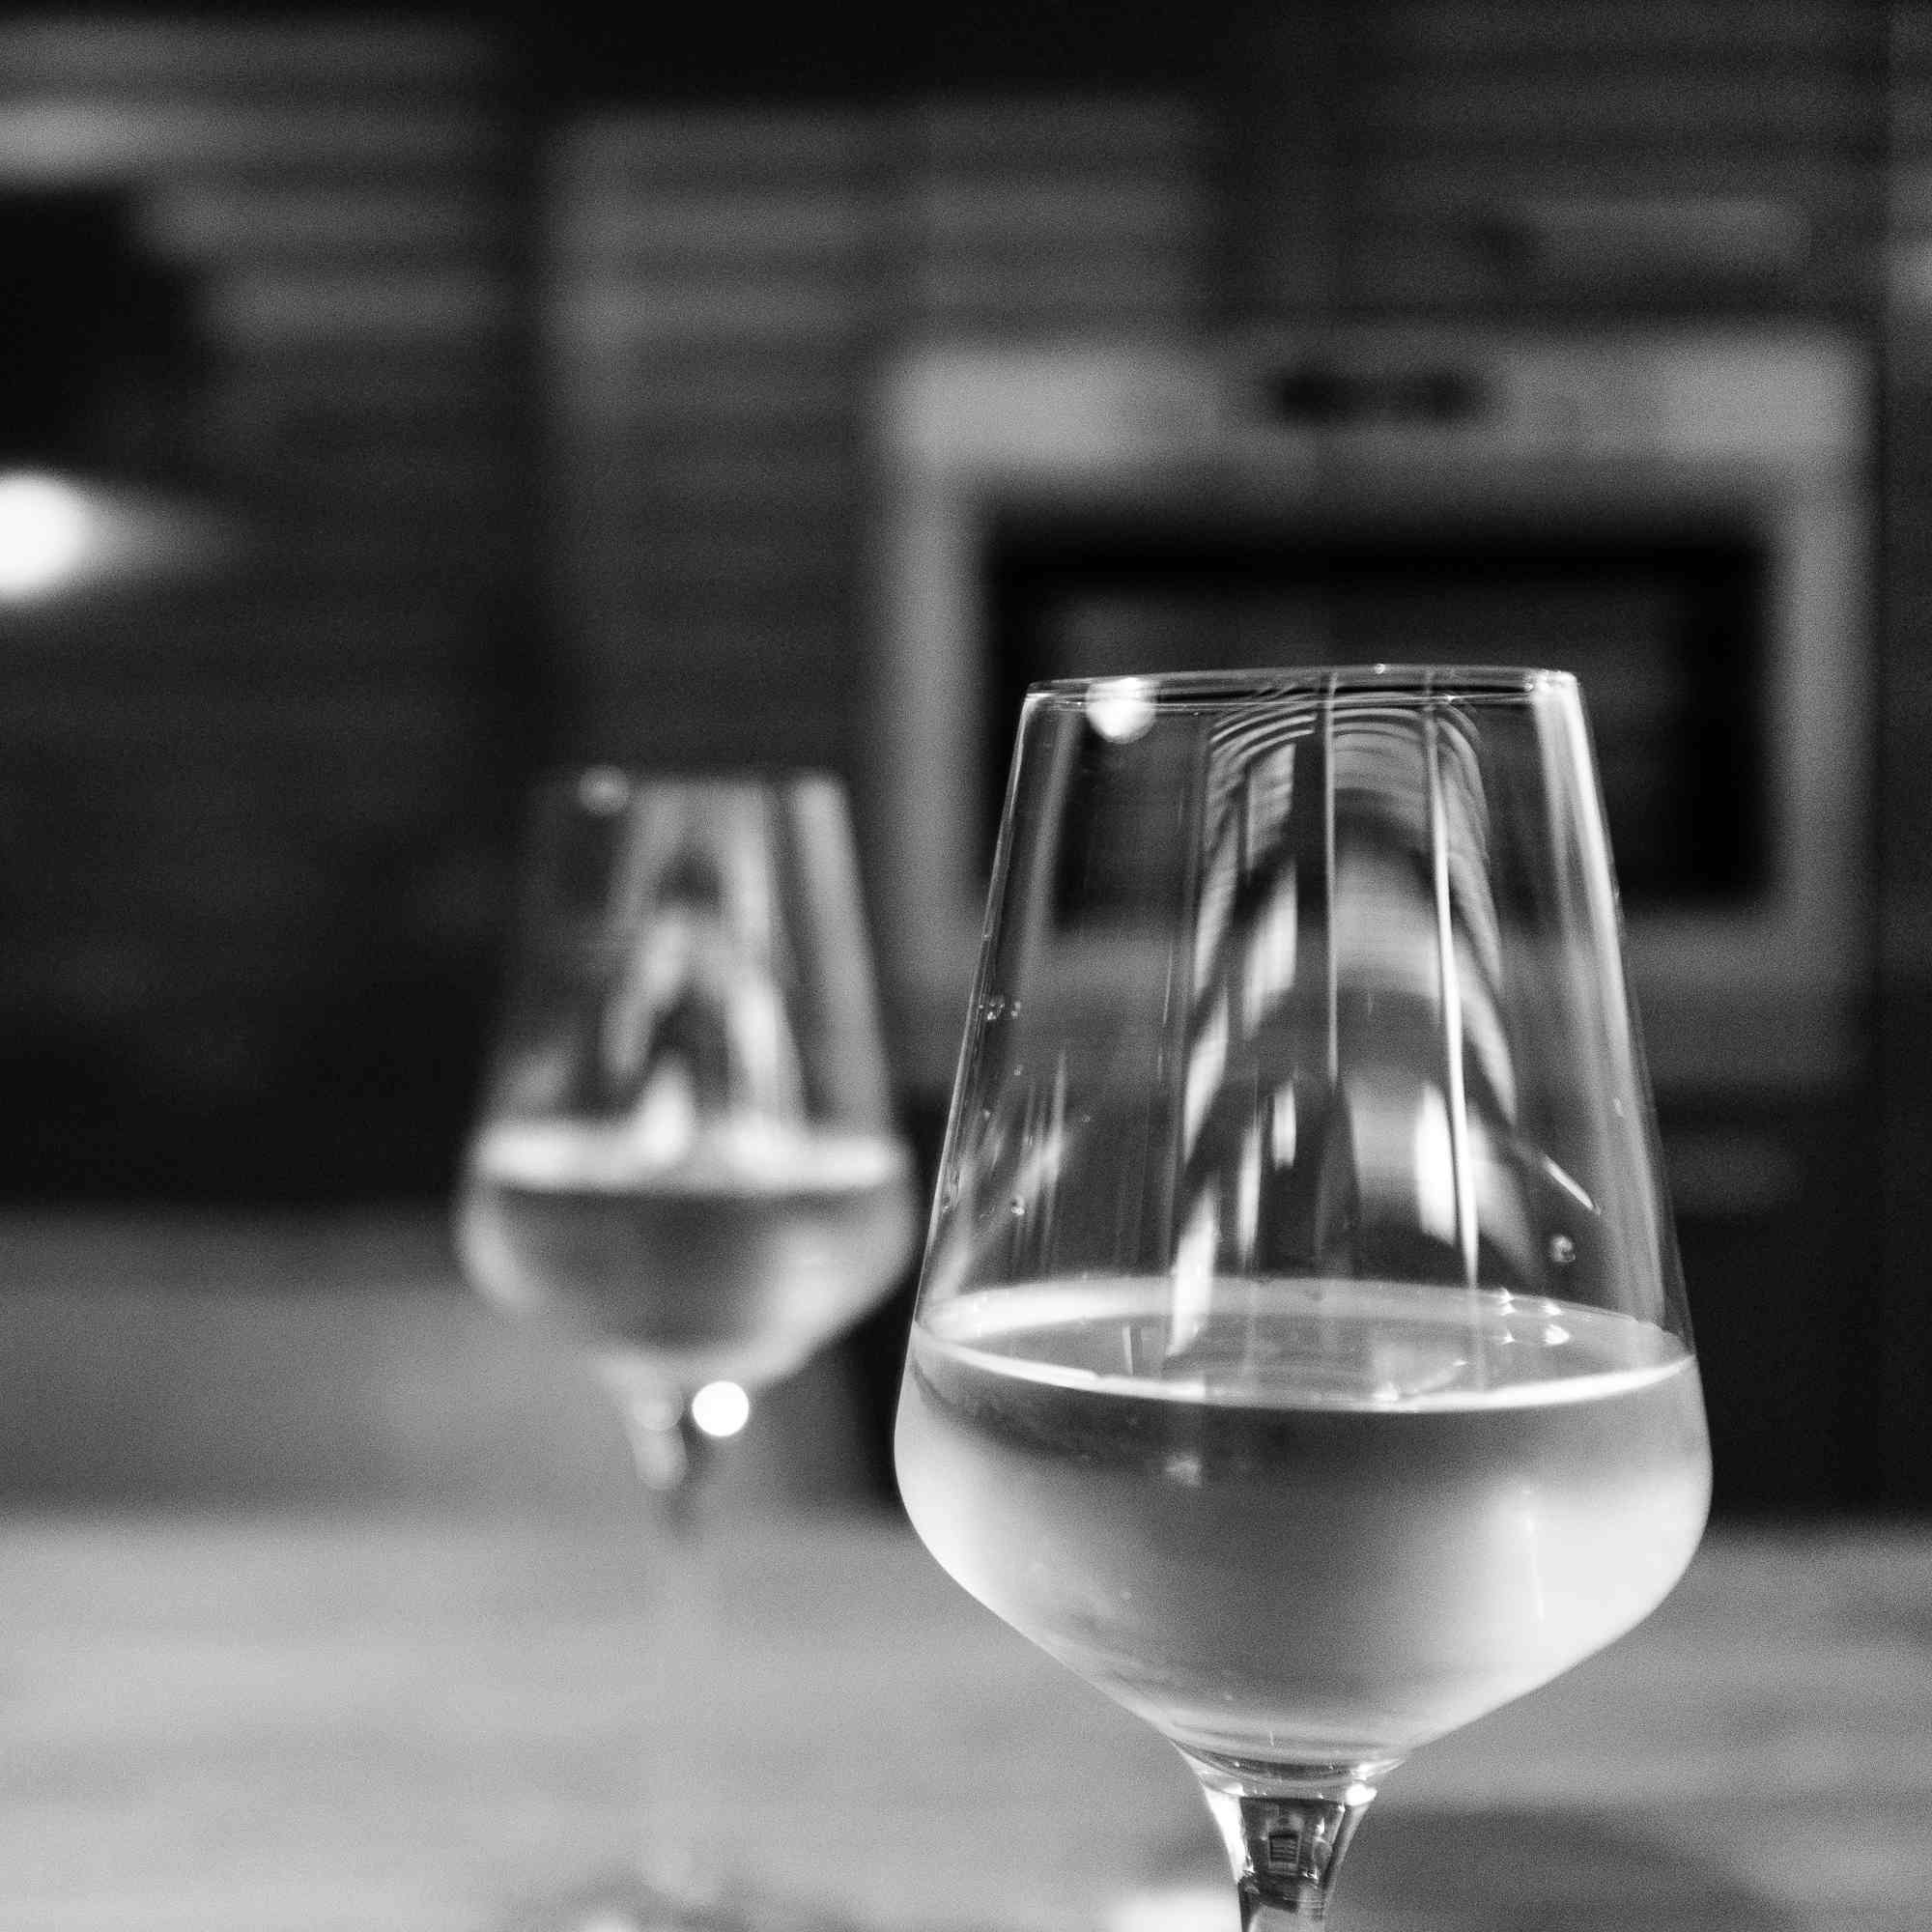 White wine glasses on table